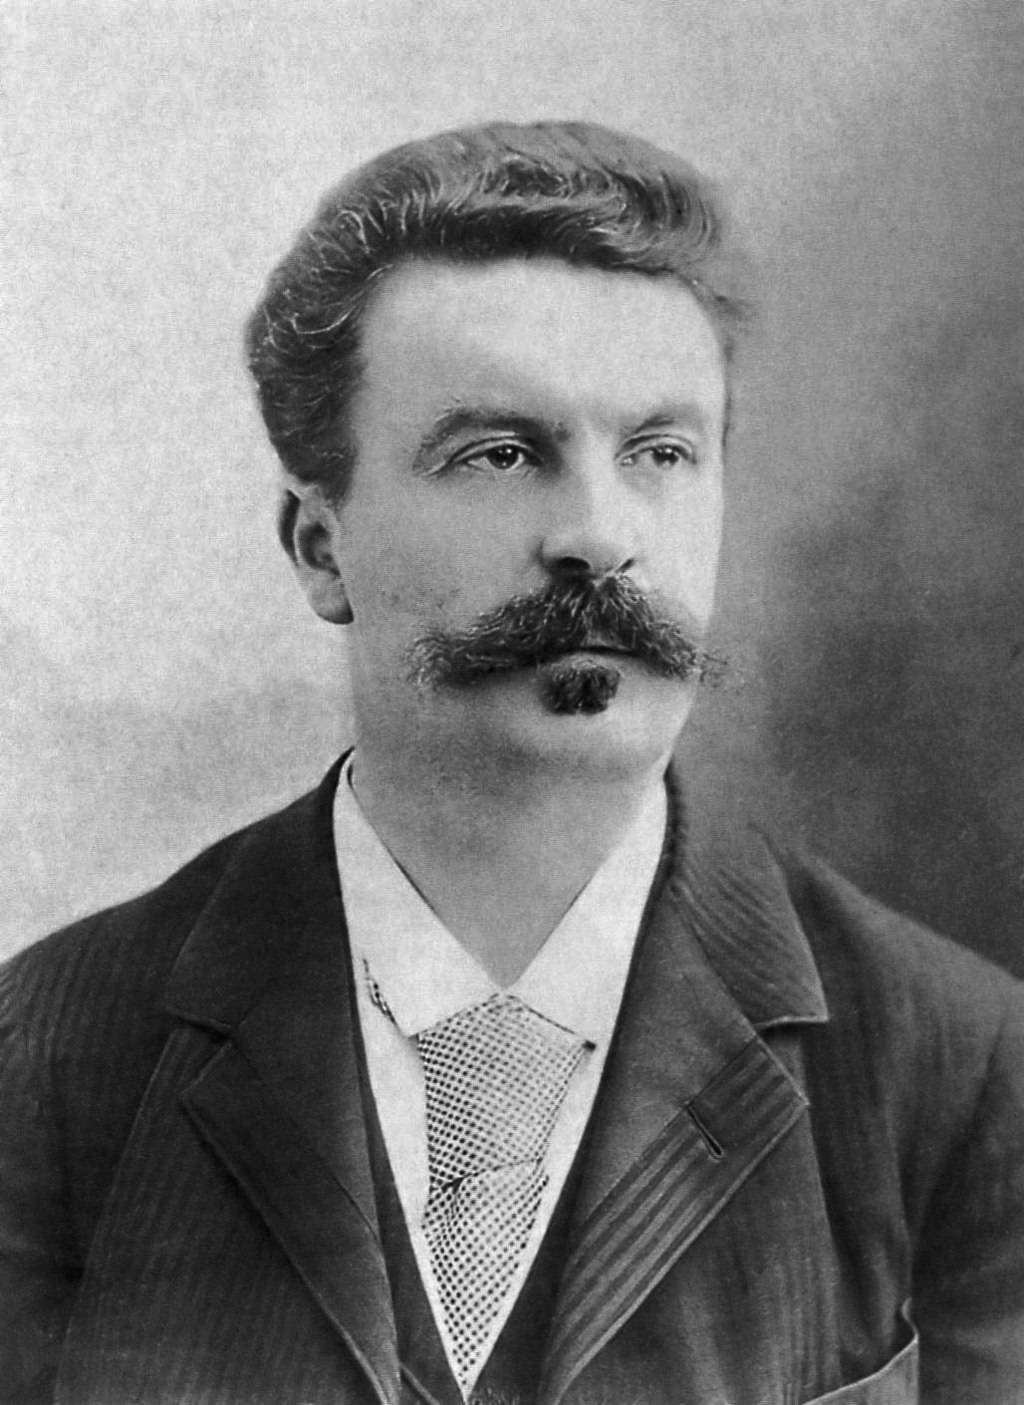 Guy de Maupassant (1850 - 1893) French Writer